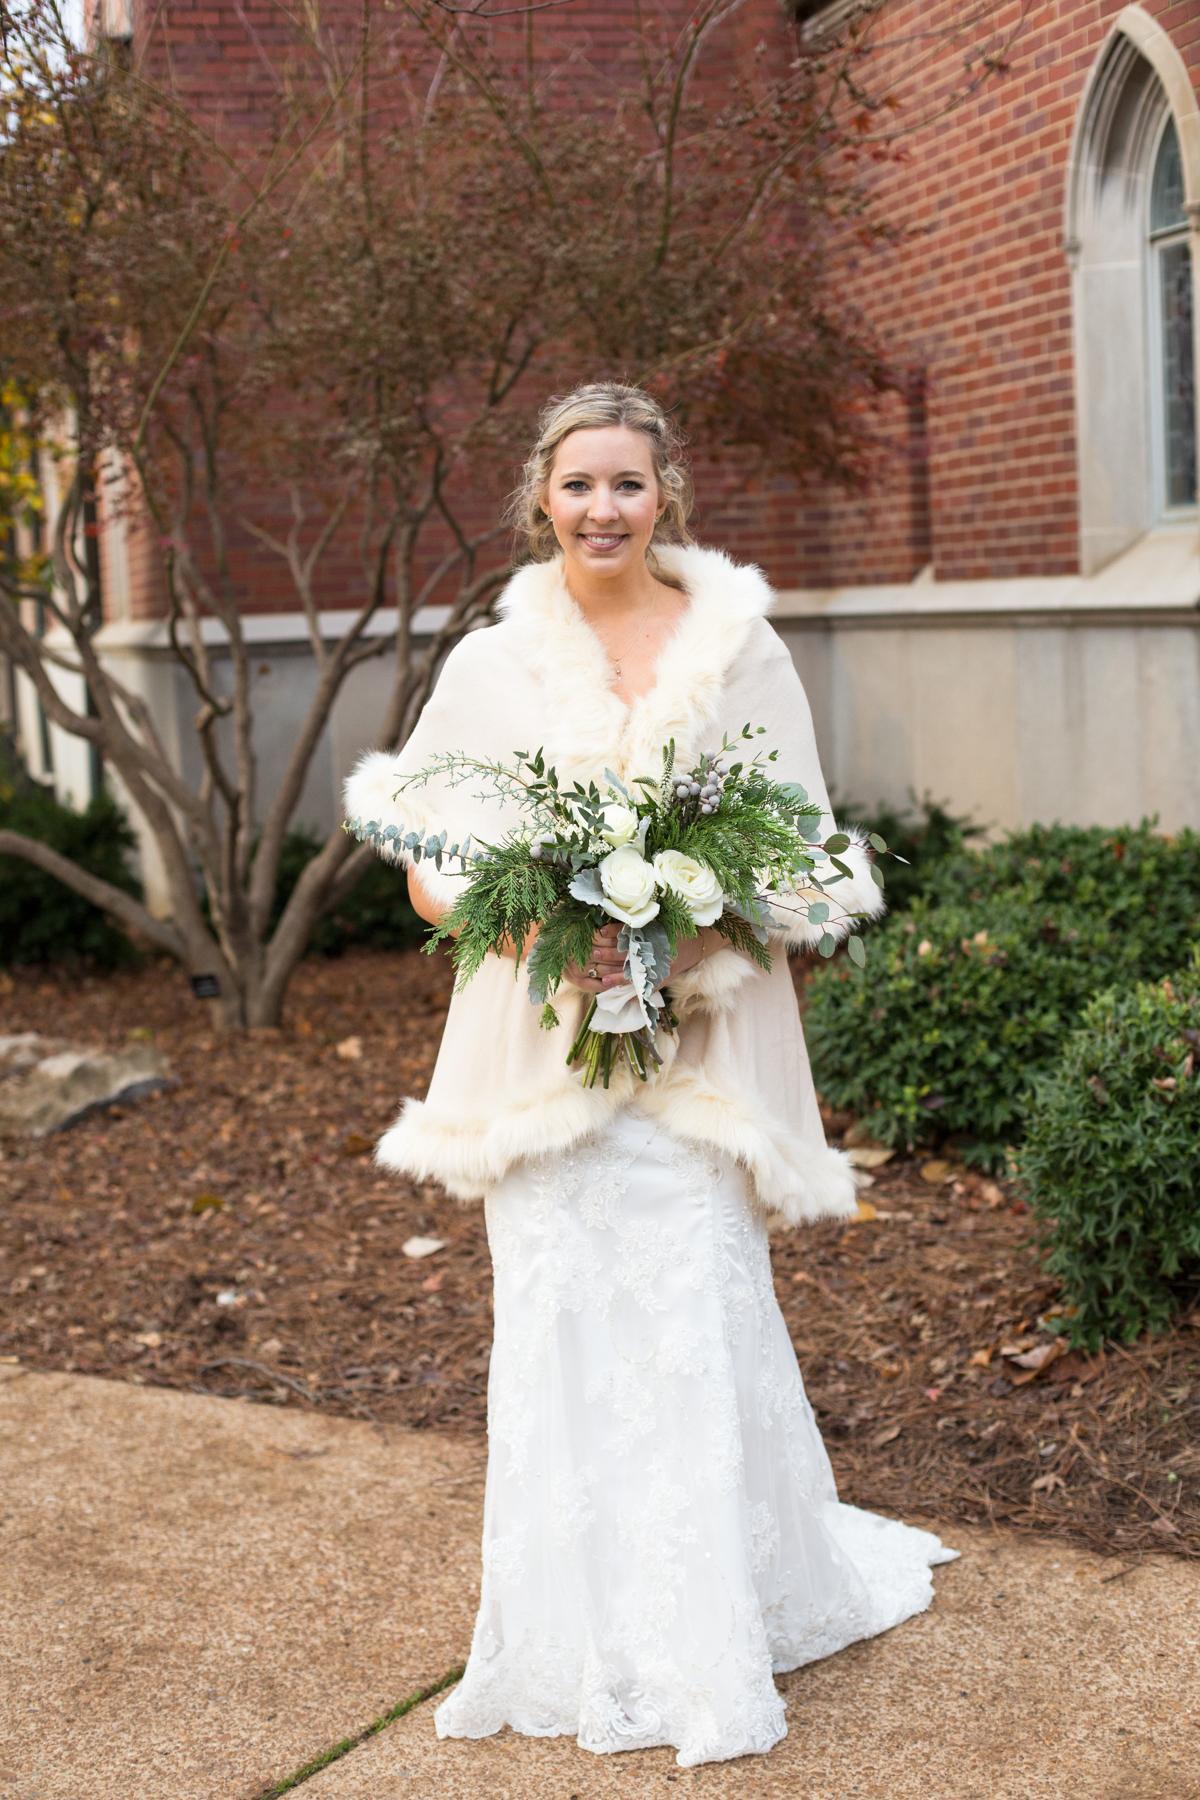 Kelli-and-Matt-Nashville-Wedding-Sneak-Peak-0176.jpg